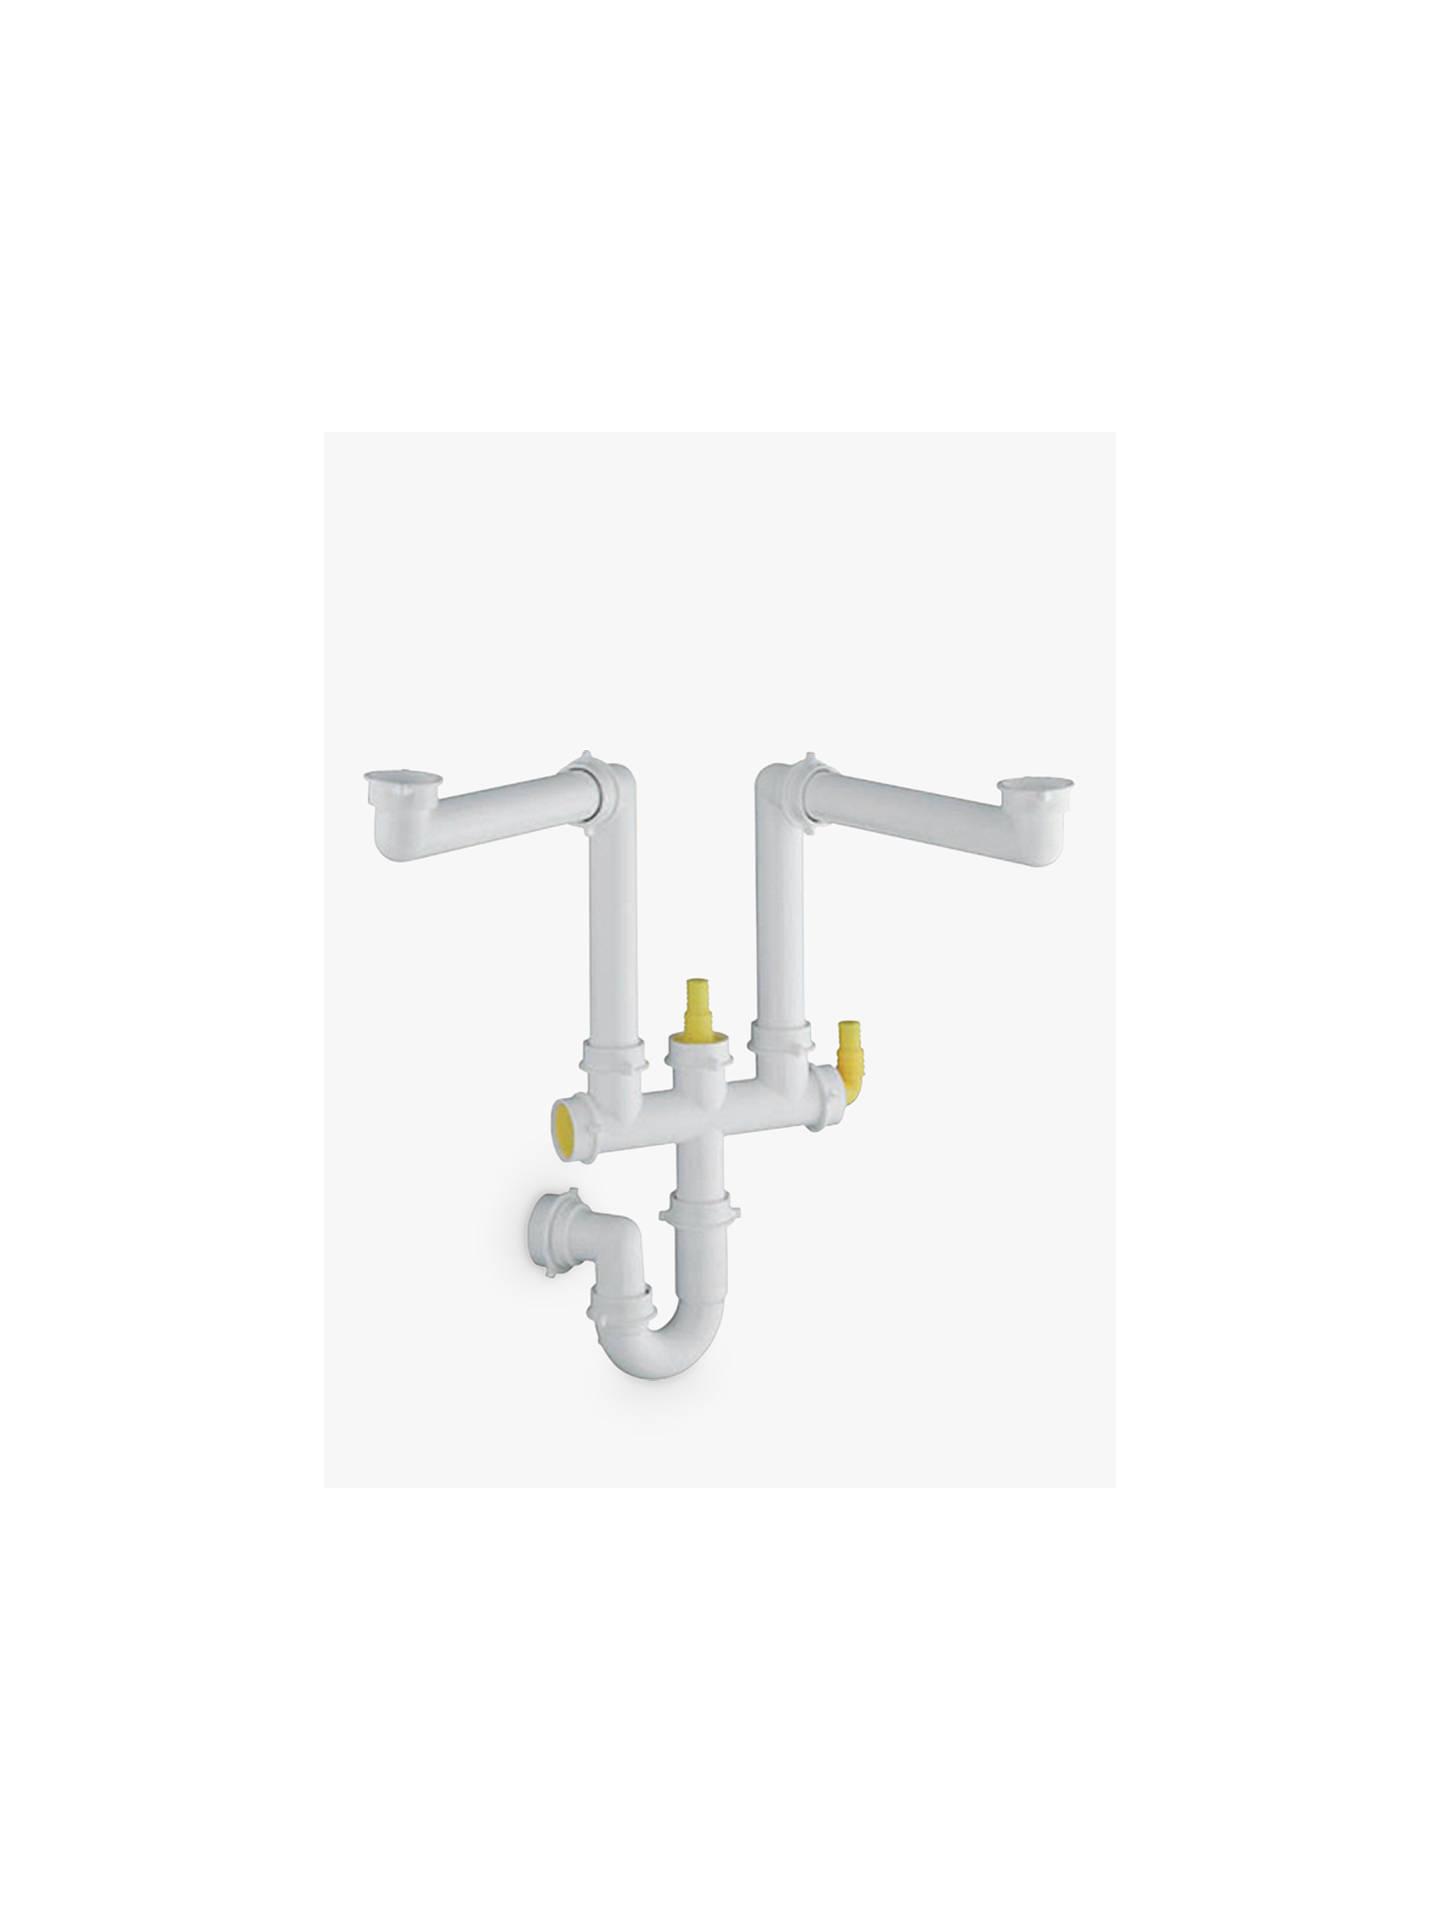 Blanco 2 Bowl Kitchen Sink Odour Trap Plumbing Connector